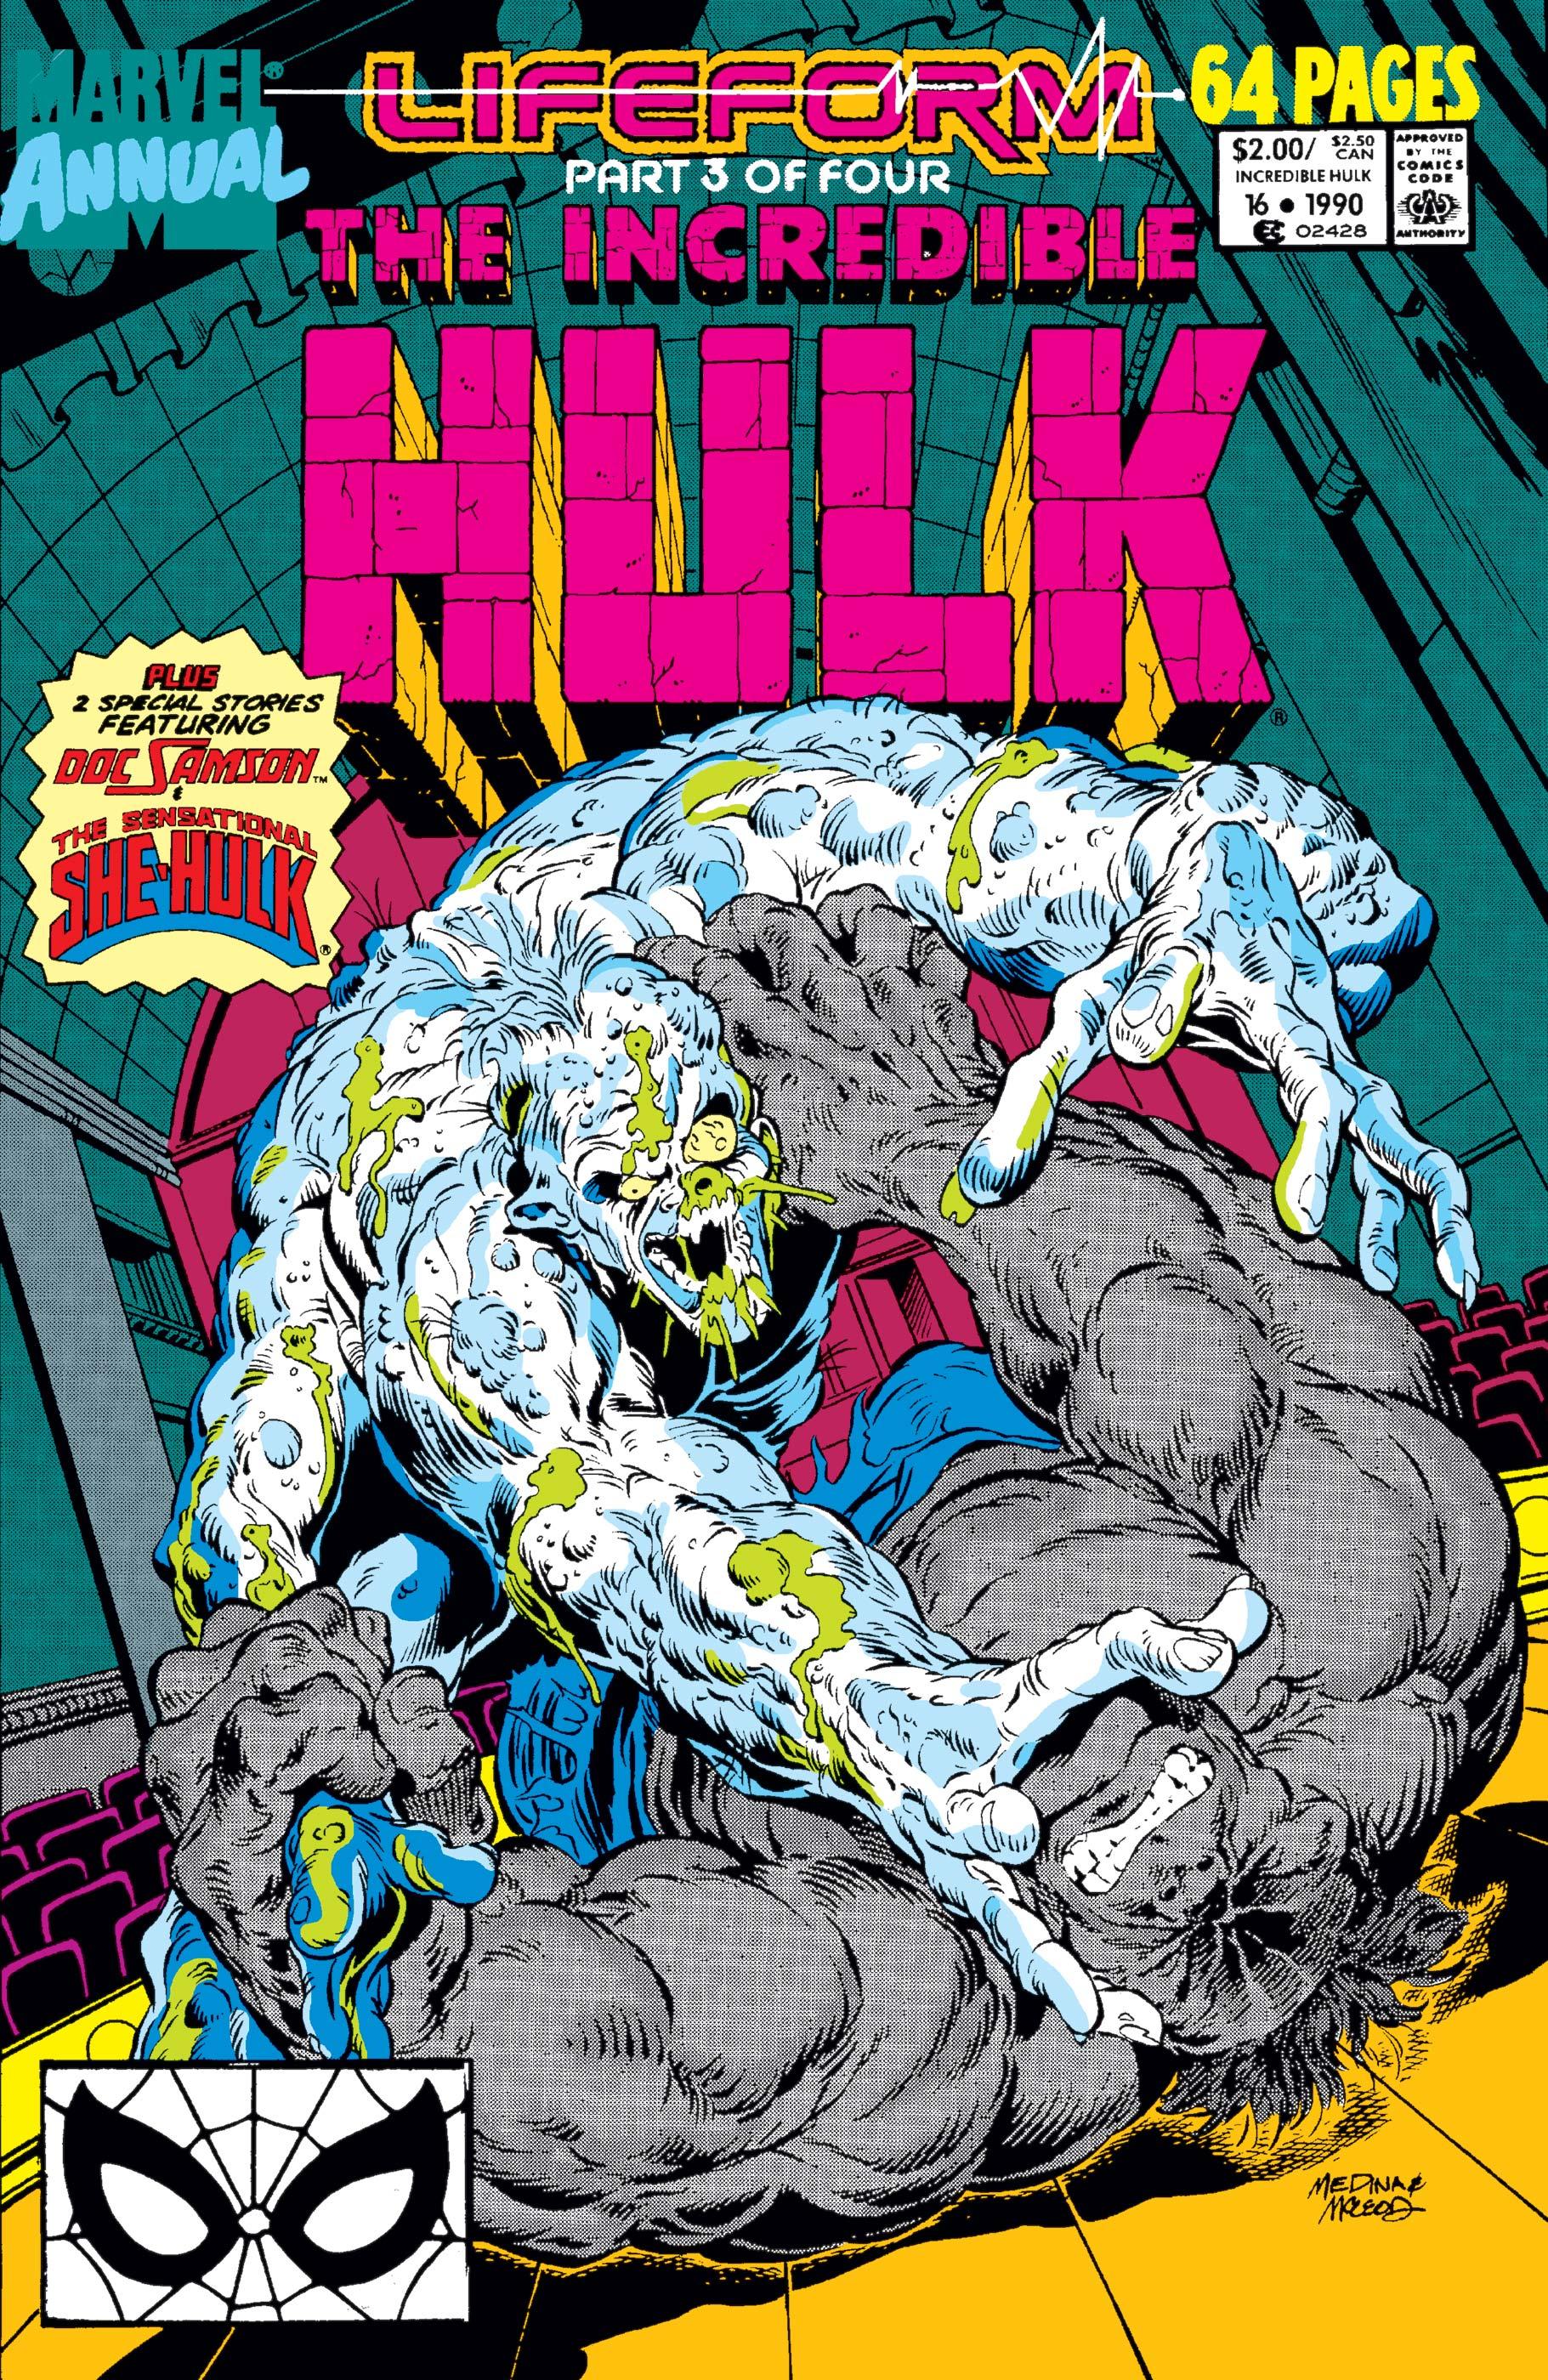 Incredible Hulk Annual (1976) #16